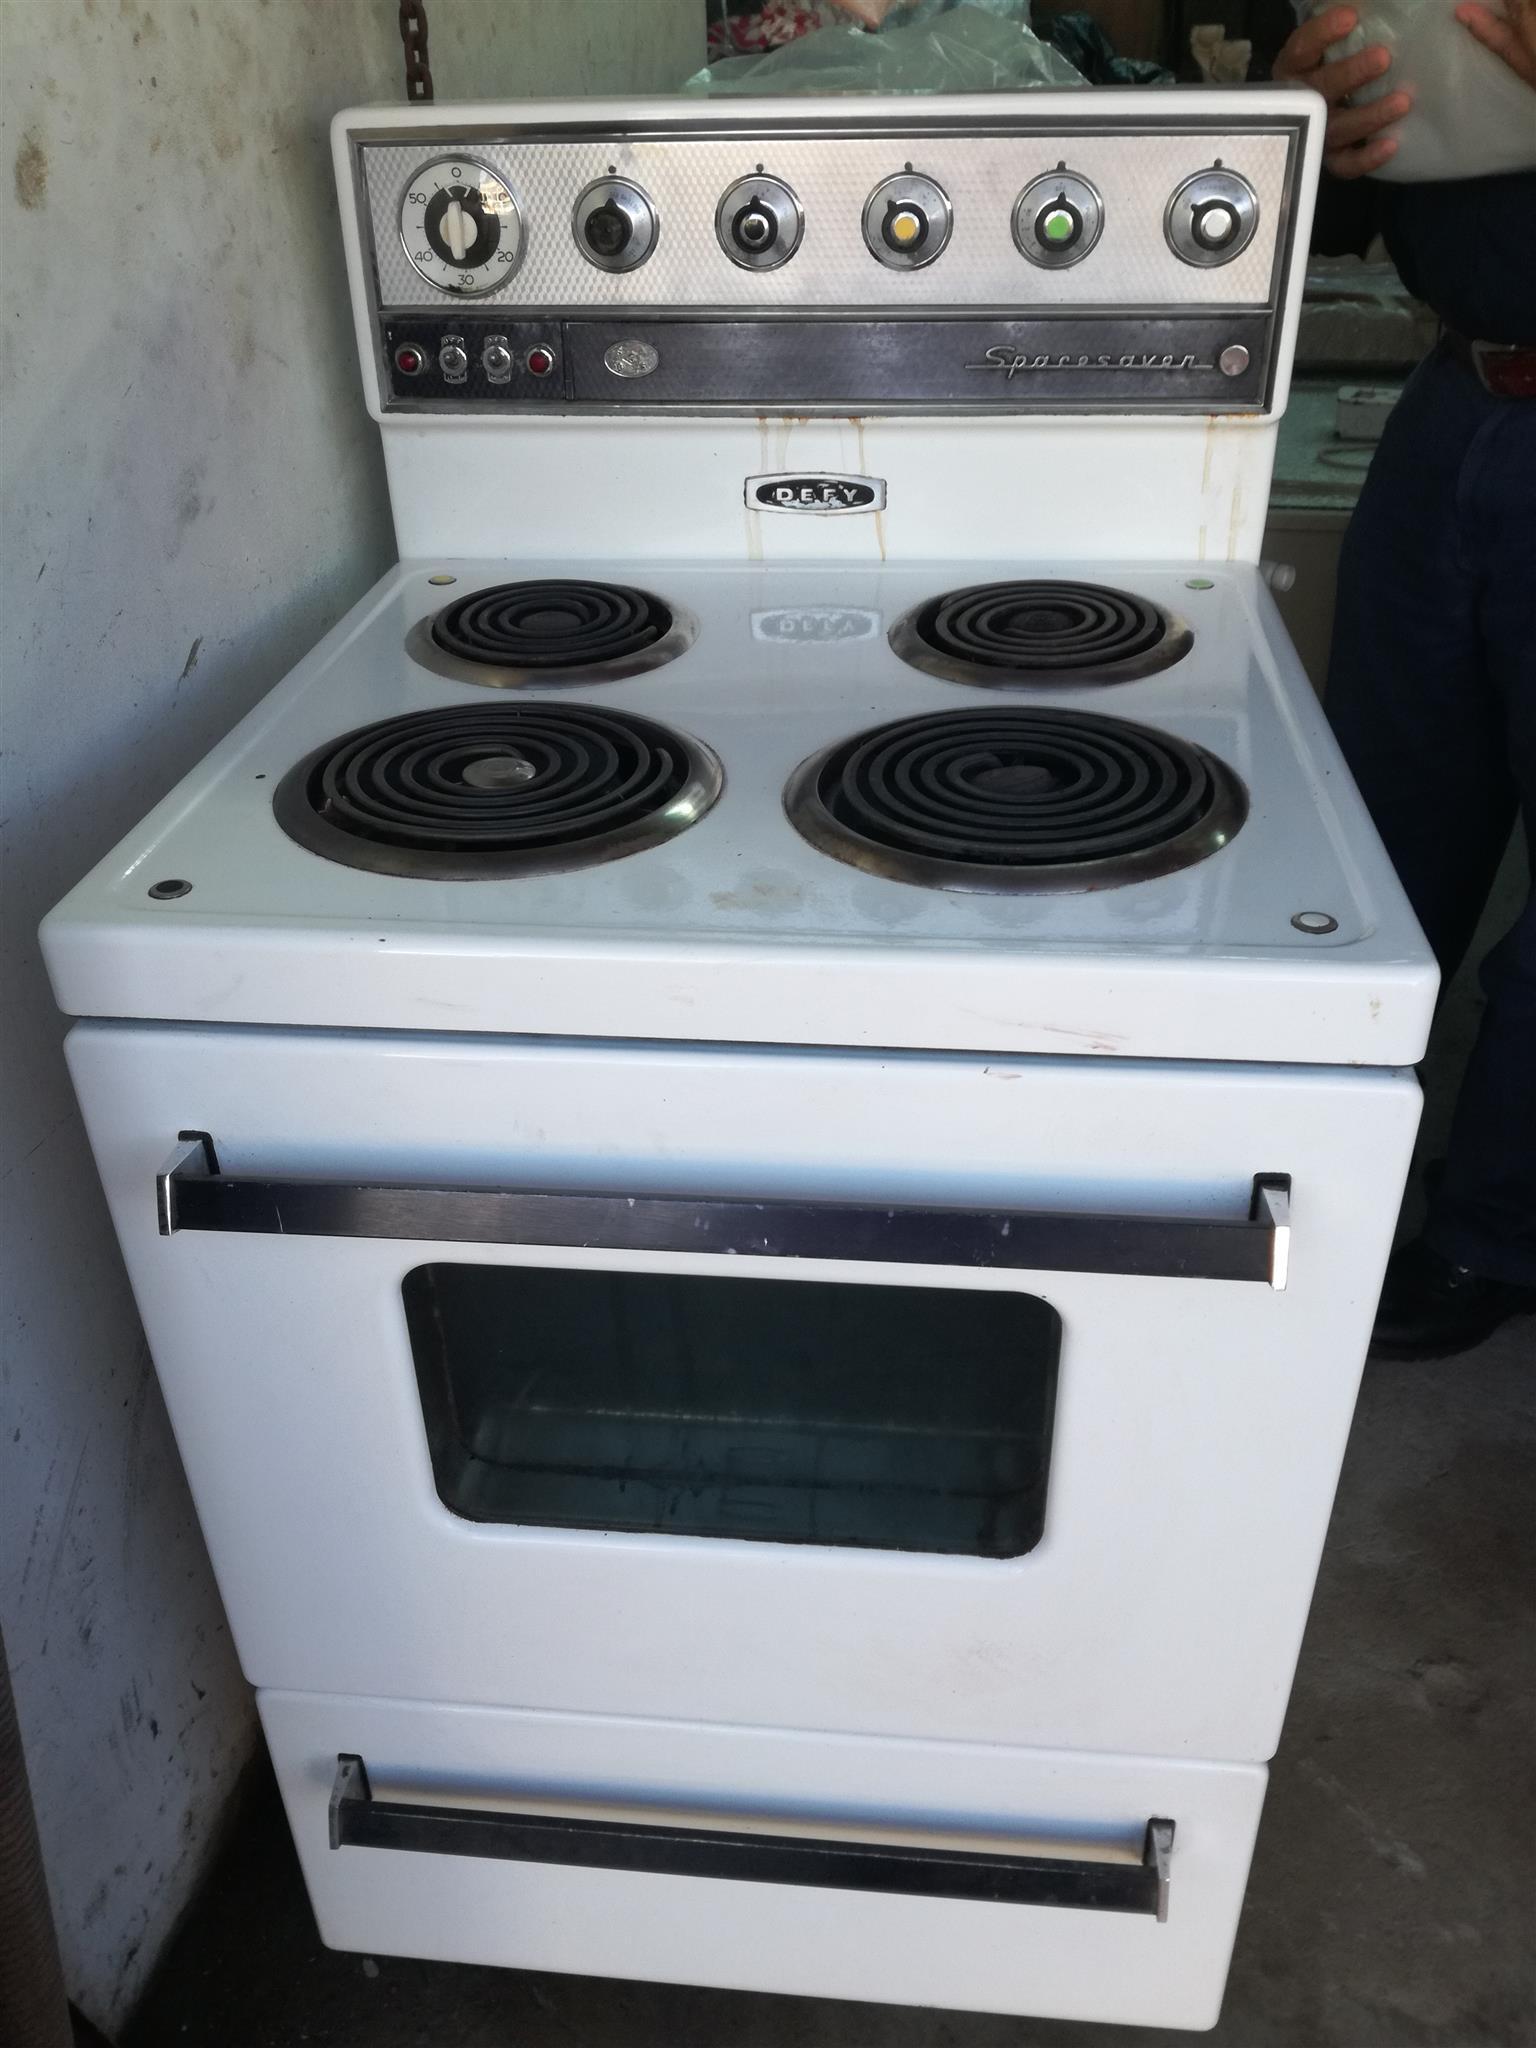 4 plate Defy stove